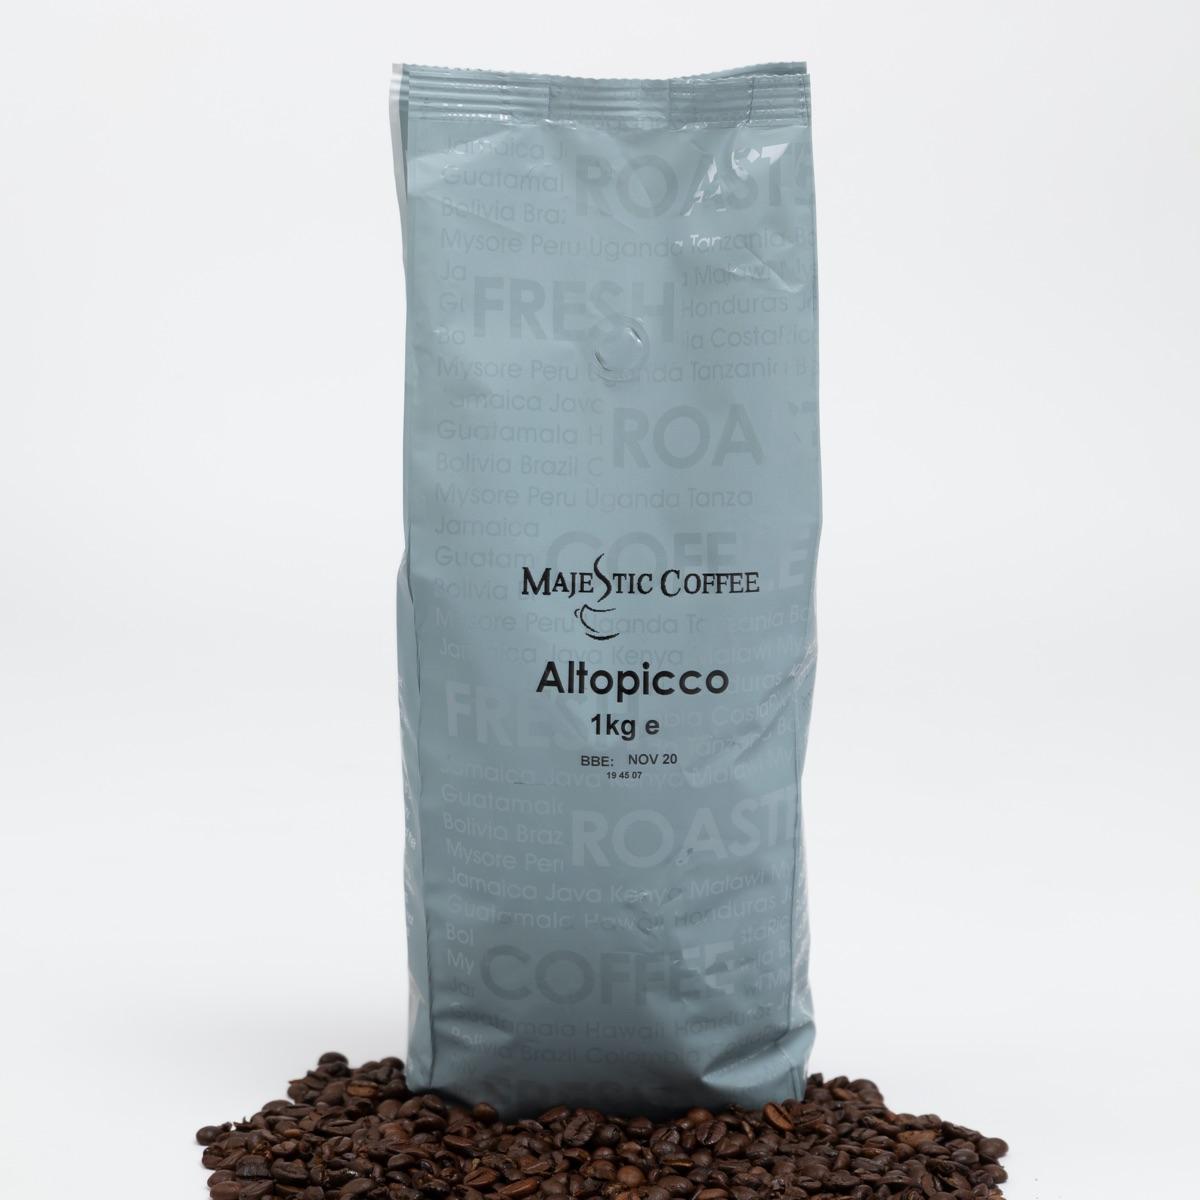 Altopicco Coffee Beans 1kg